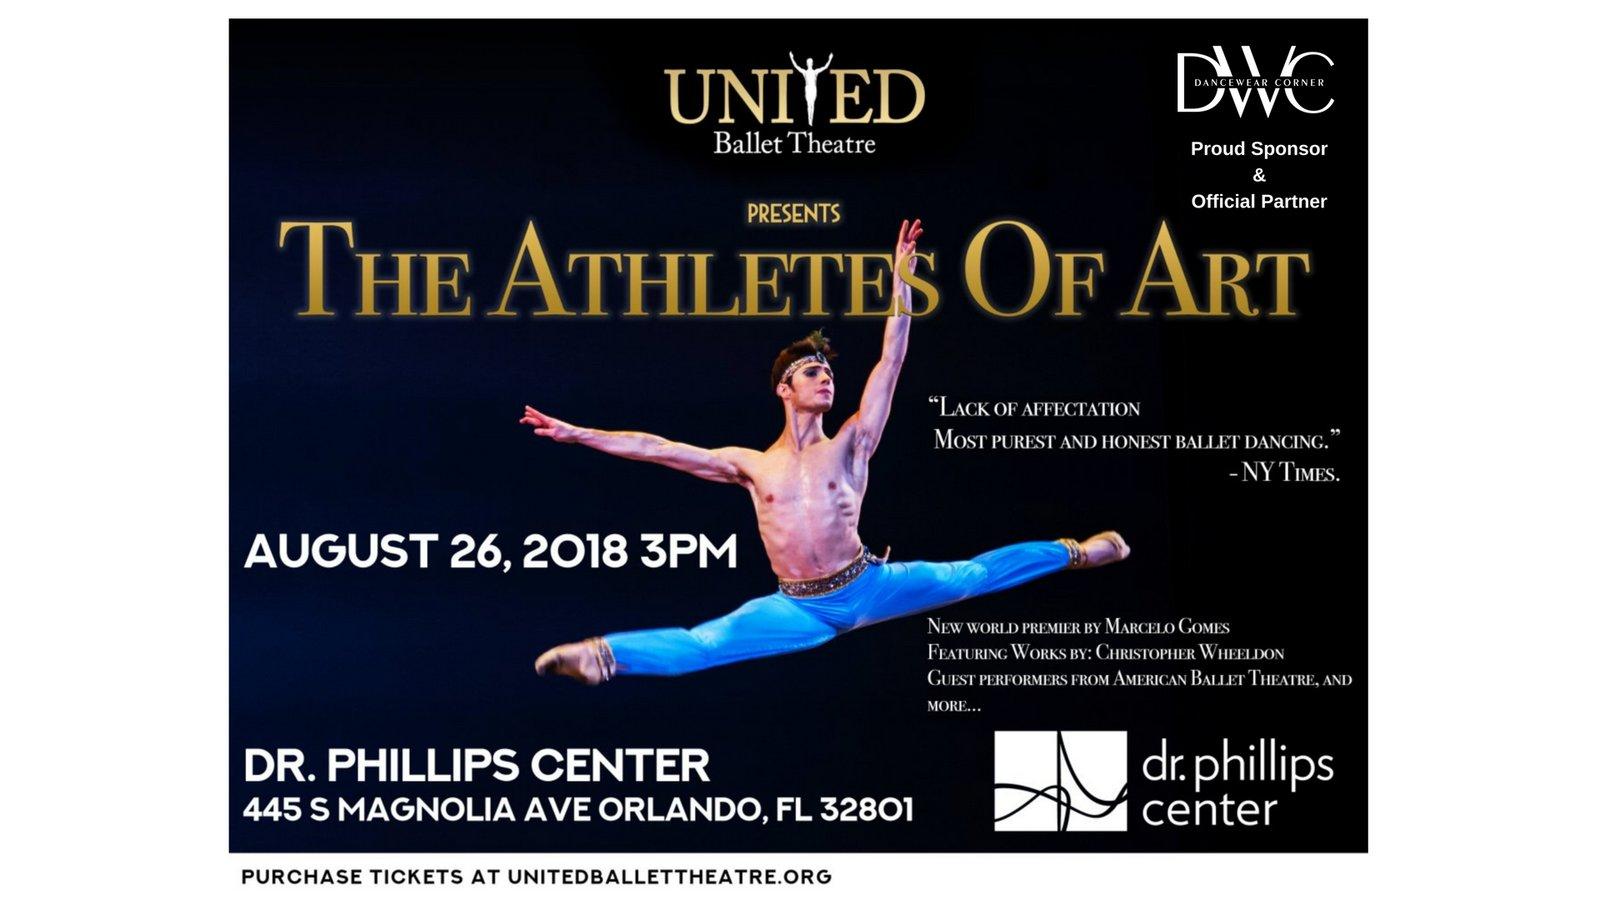 United Ballet Thetre